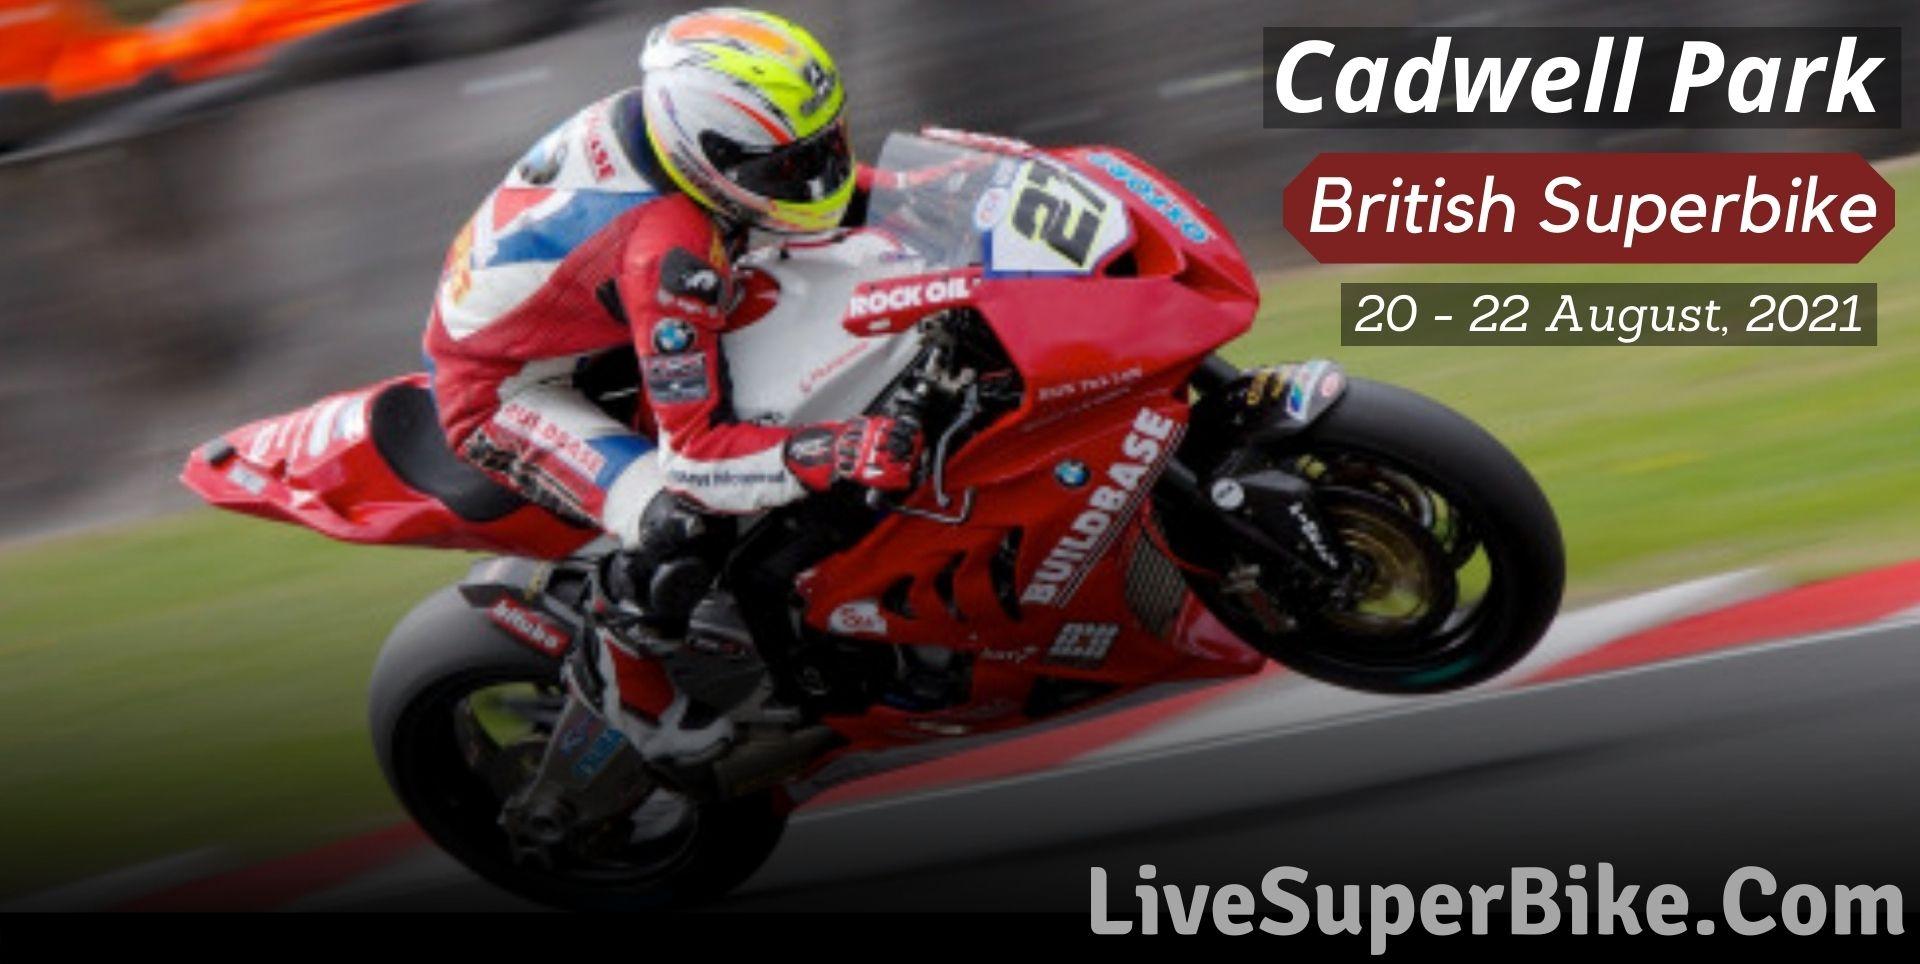 Cadwell Park British Superbike Live Stream 2021